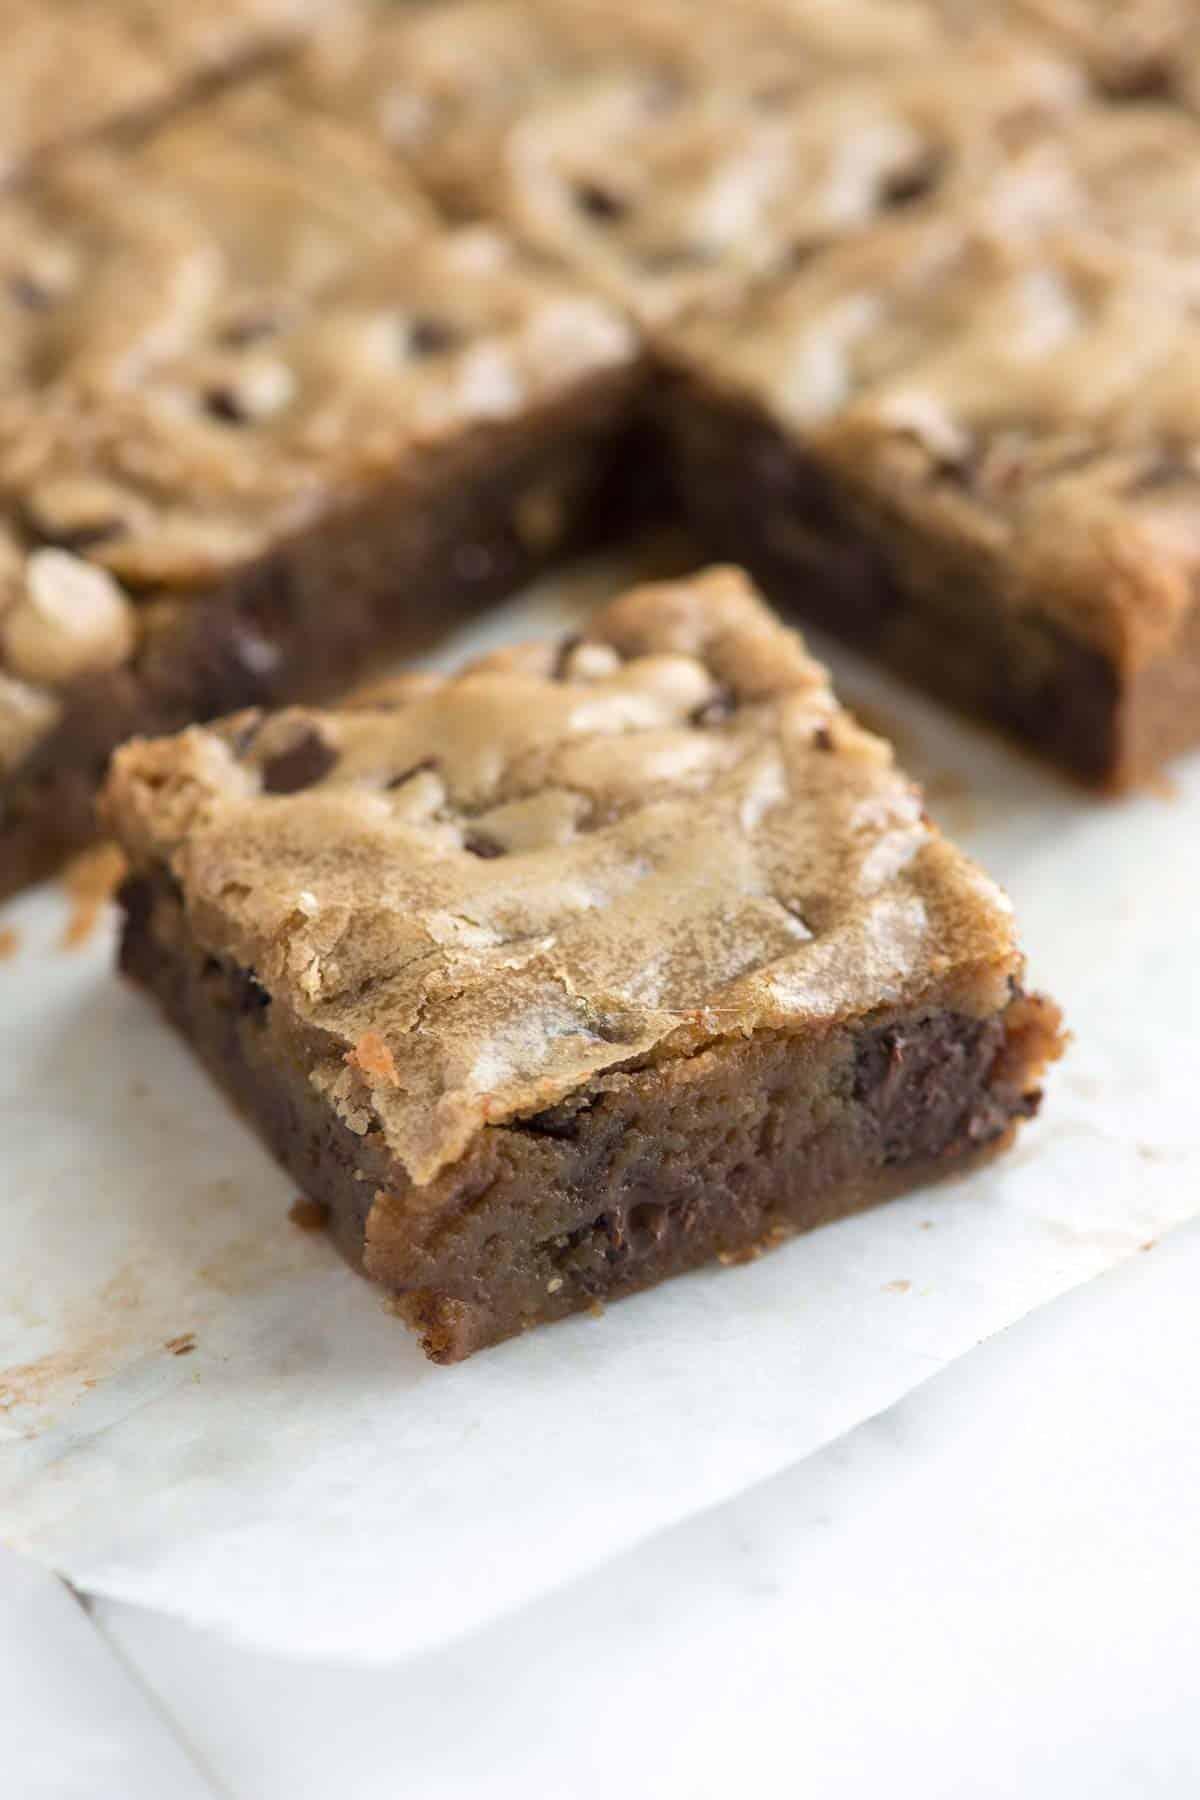 How Do You Make Chocolate Chip Cookies More Cake Like